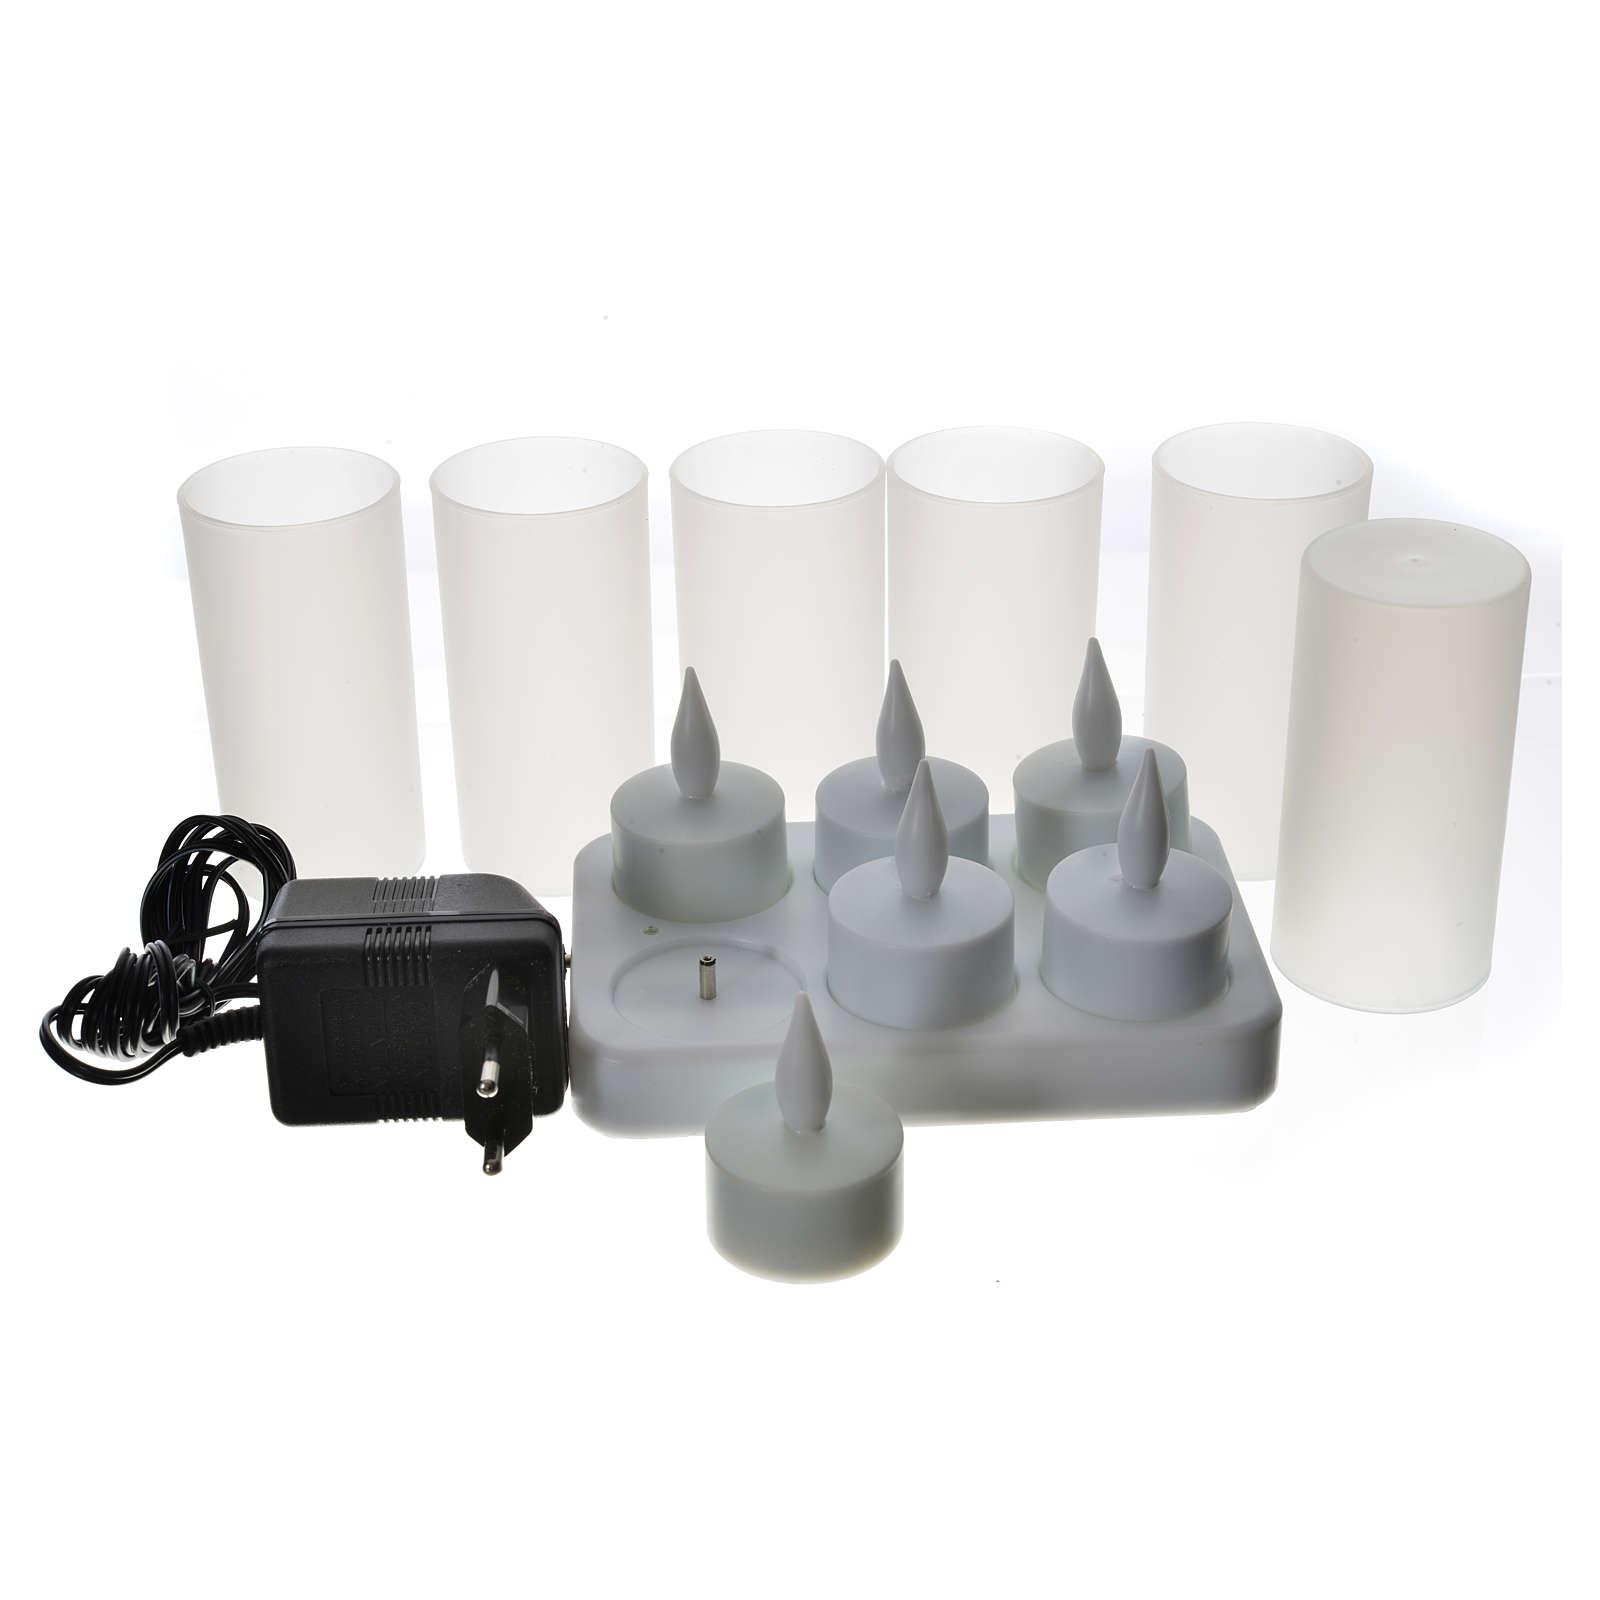 Veilleuses tealights led rechargeables 6pcs 3